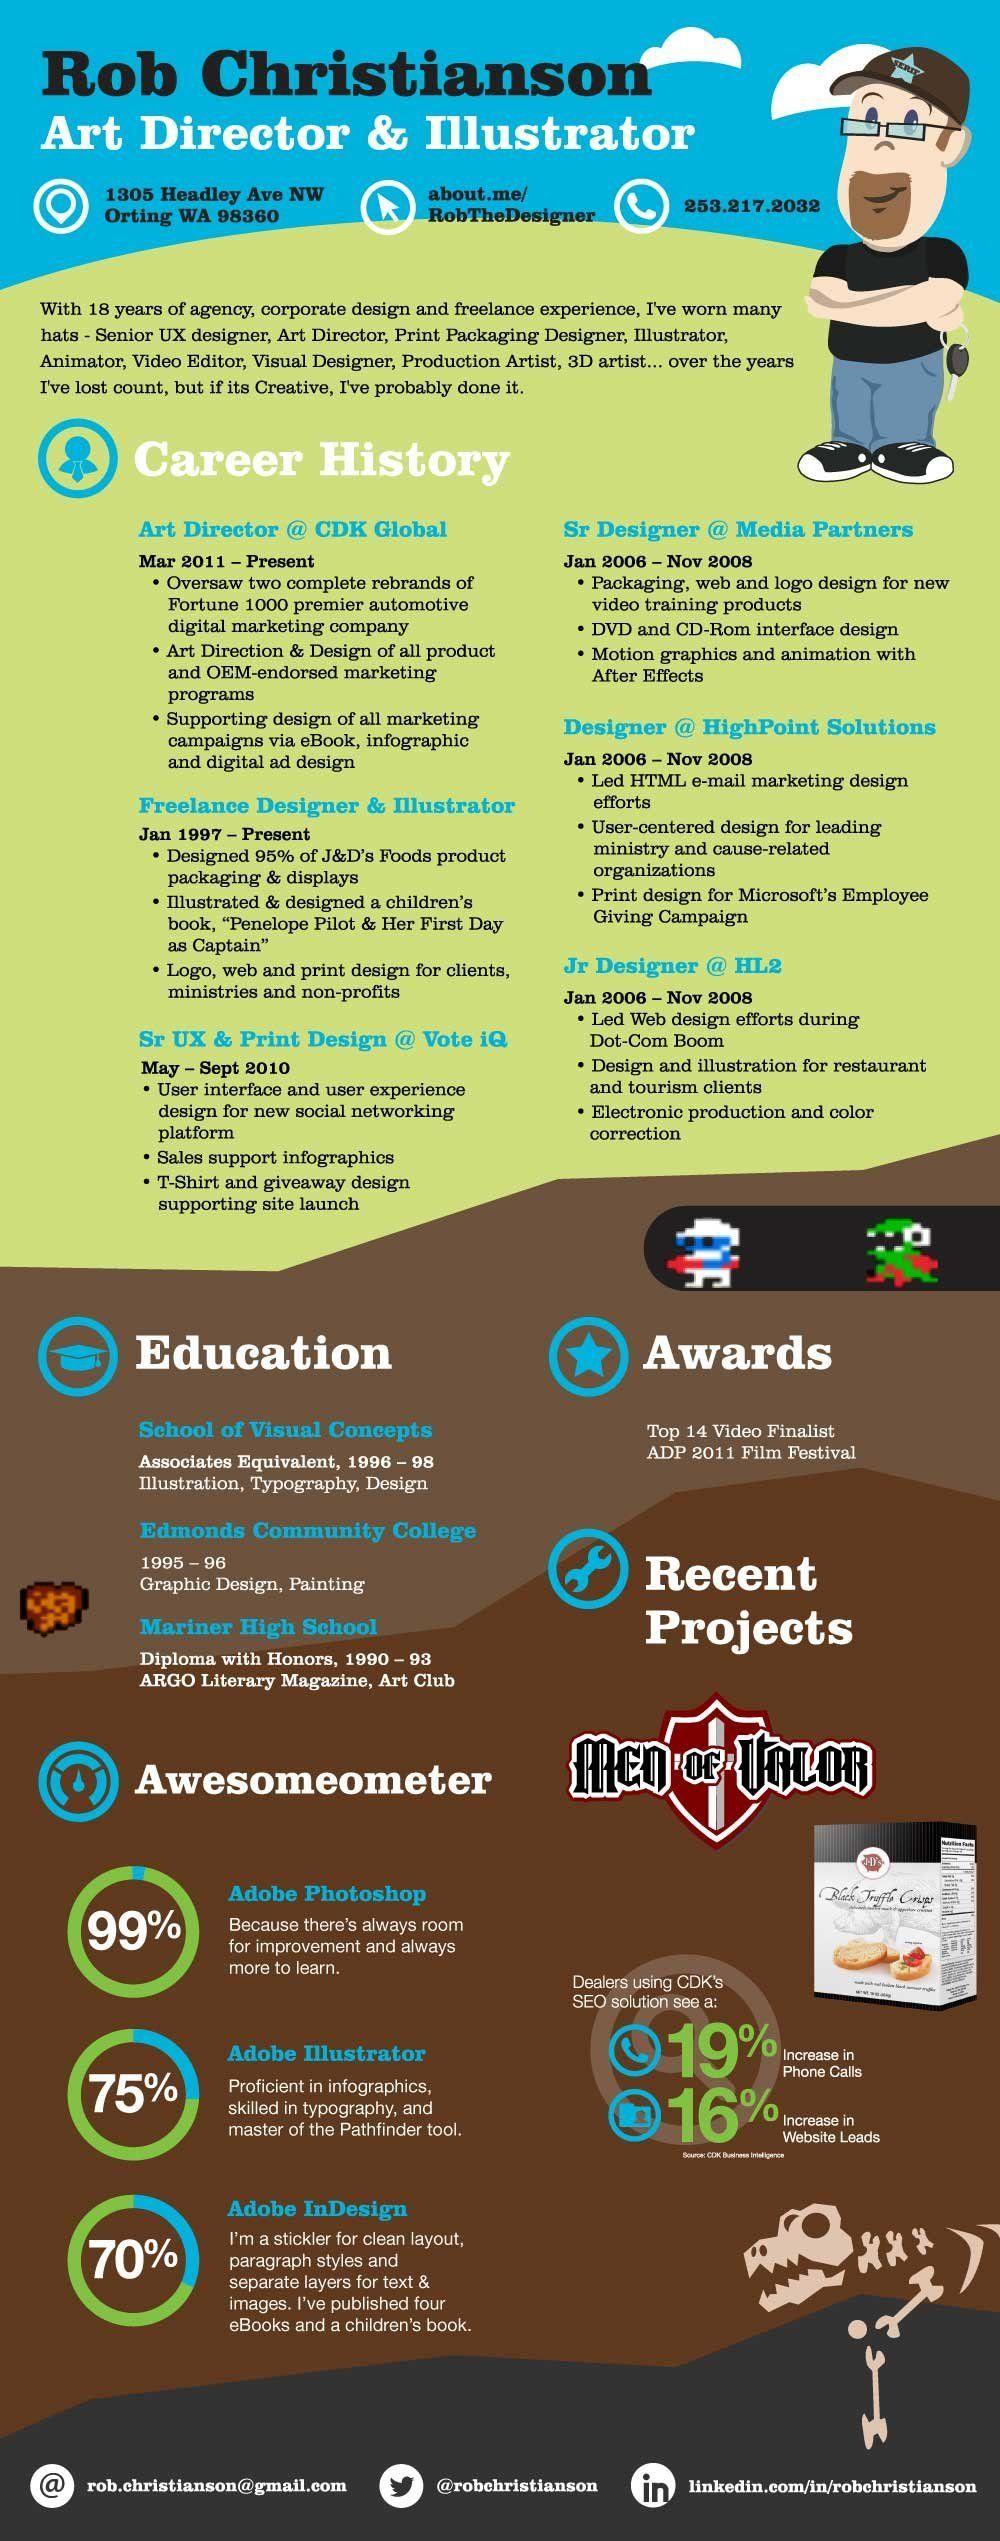 Art director rob christianson infographic resume